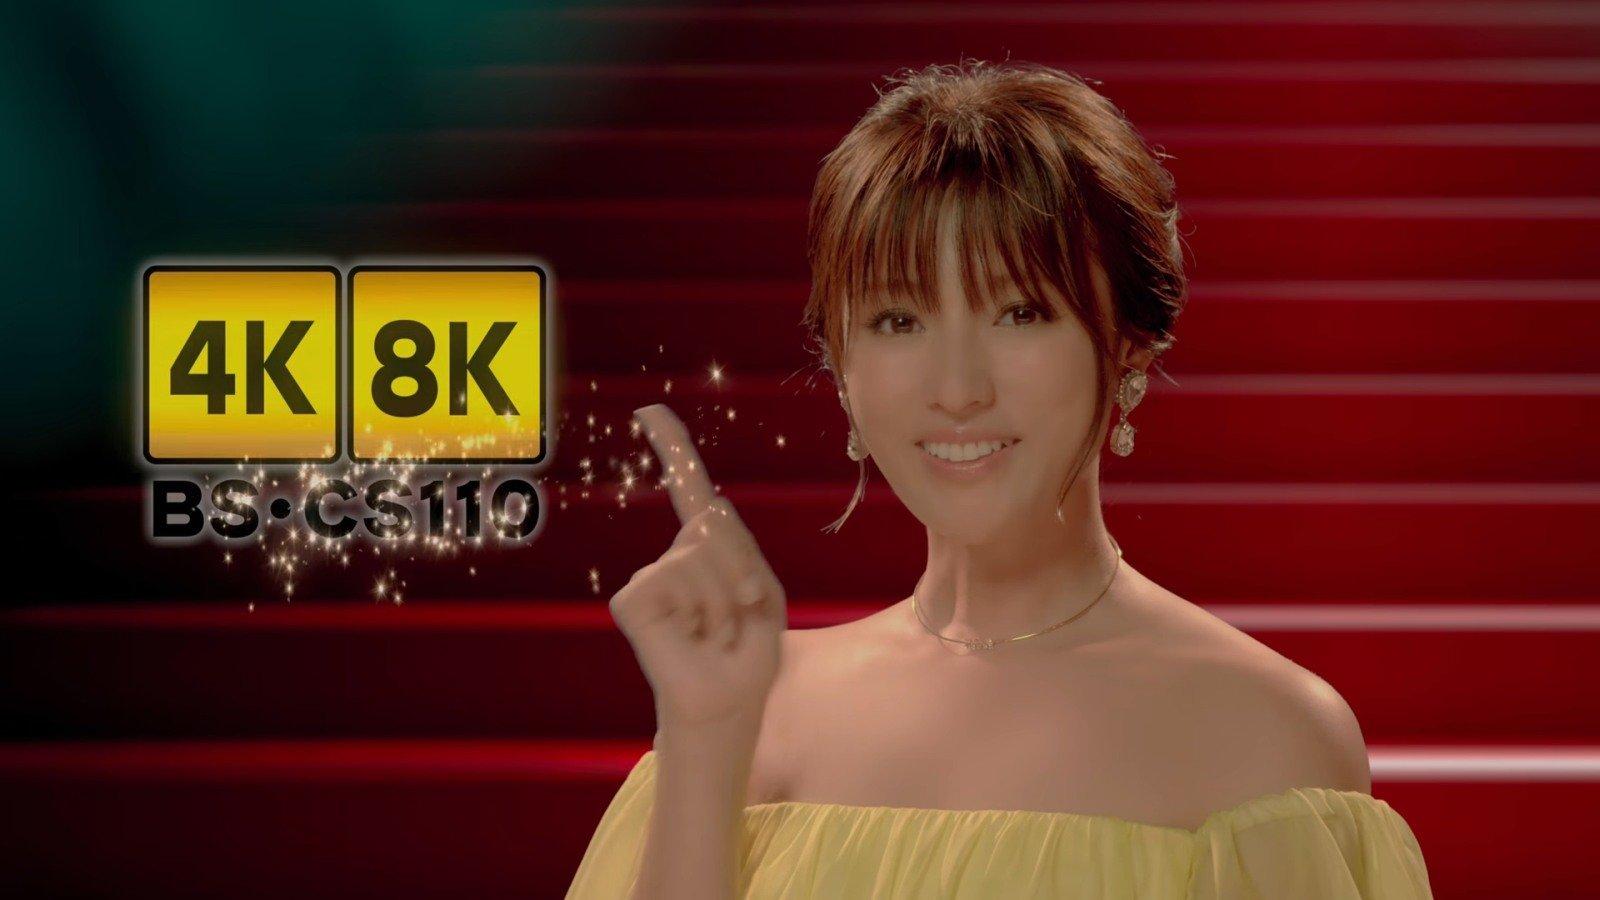 Giappone canale satellitare 8K